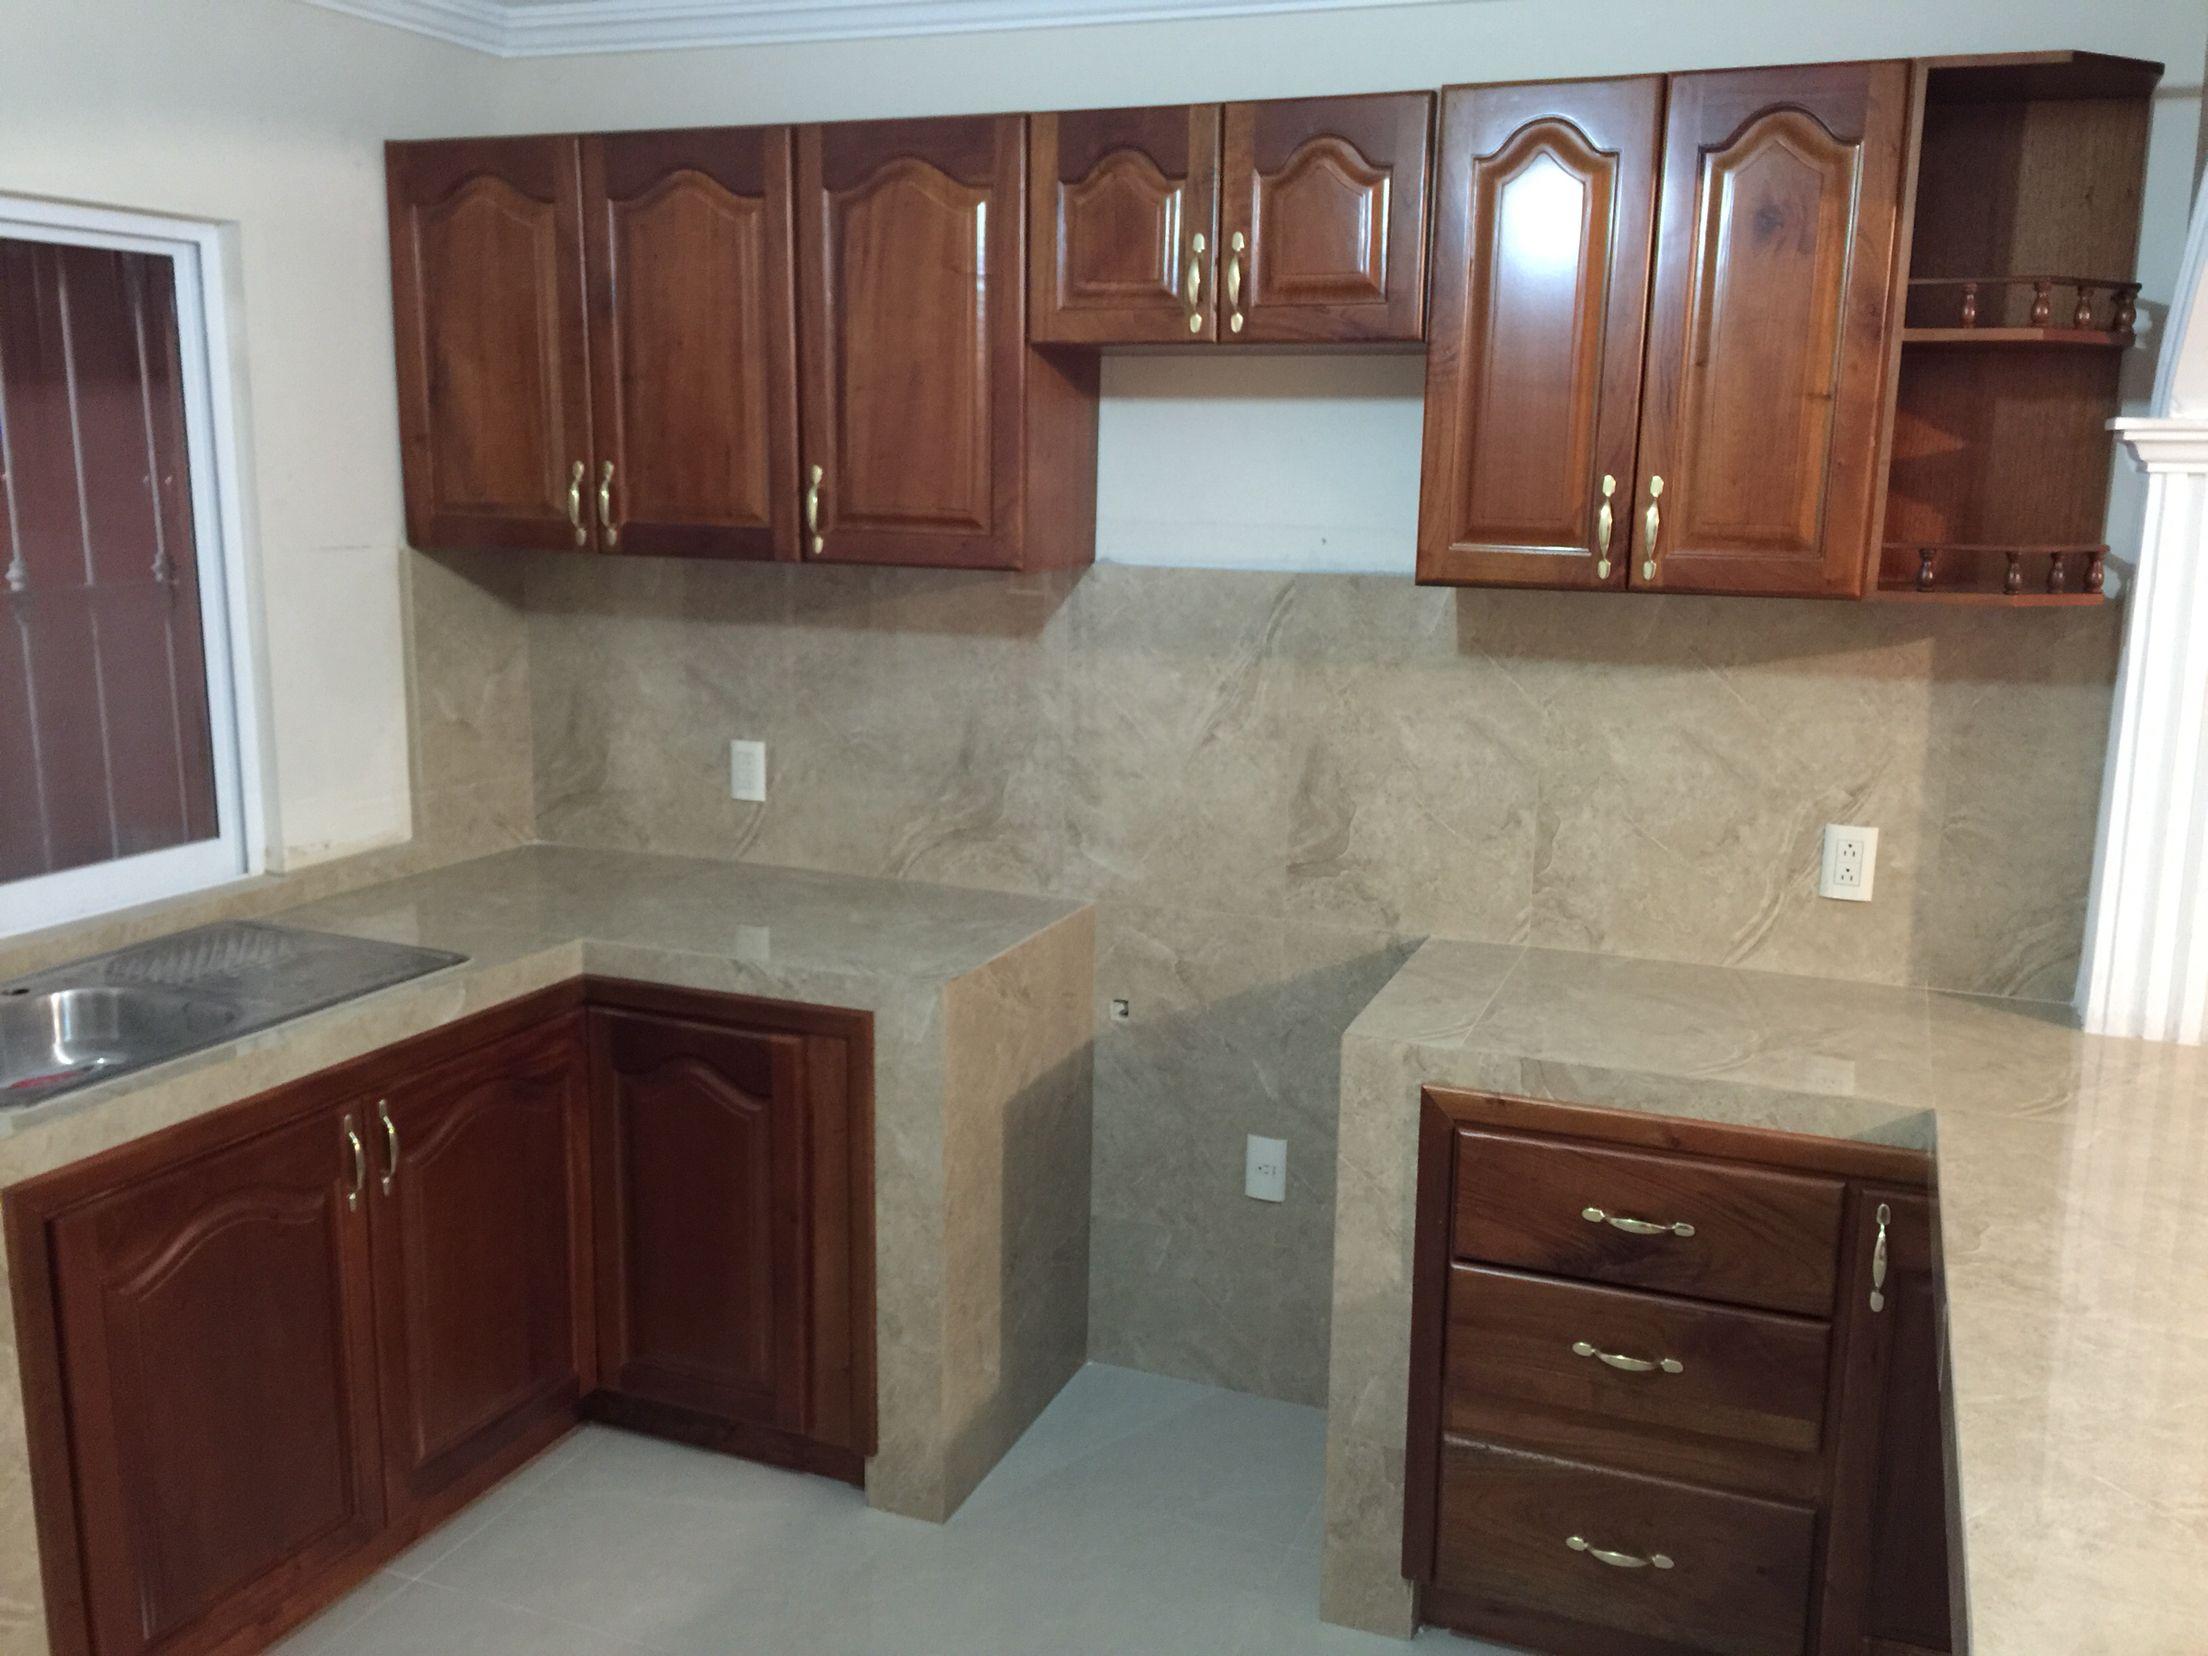 Cocina integral en madera de cedro con puertas estilo for Cocinas integrales modernas de madera